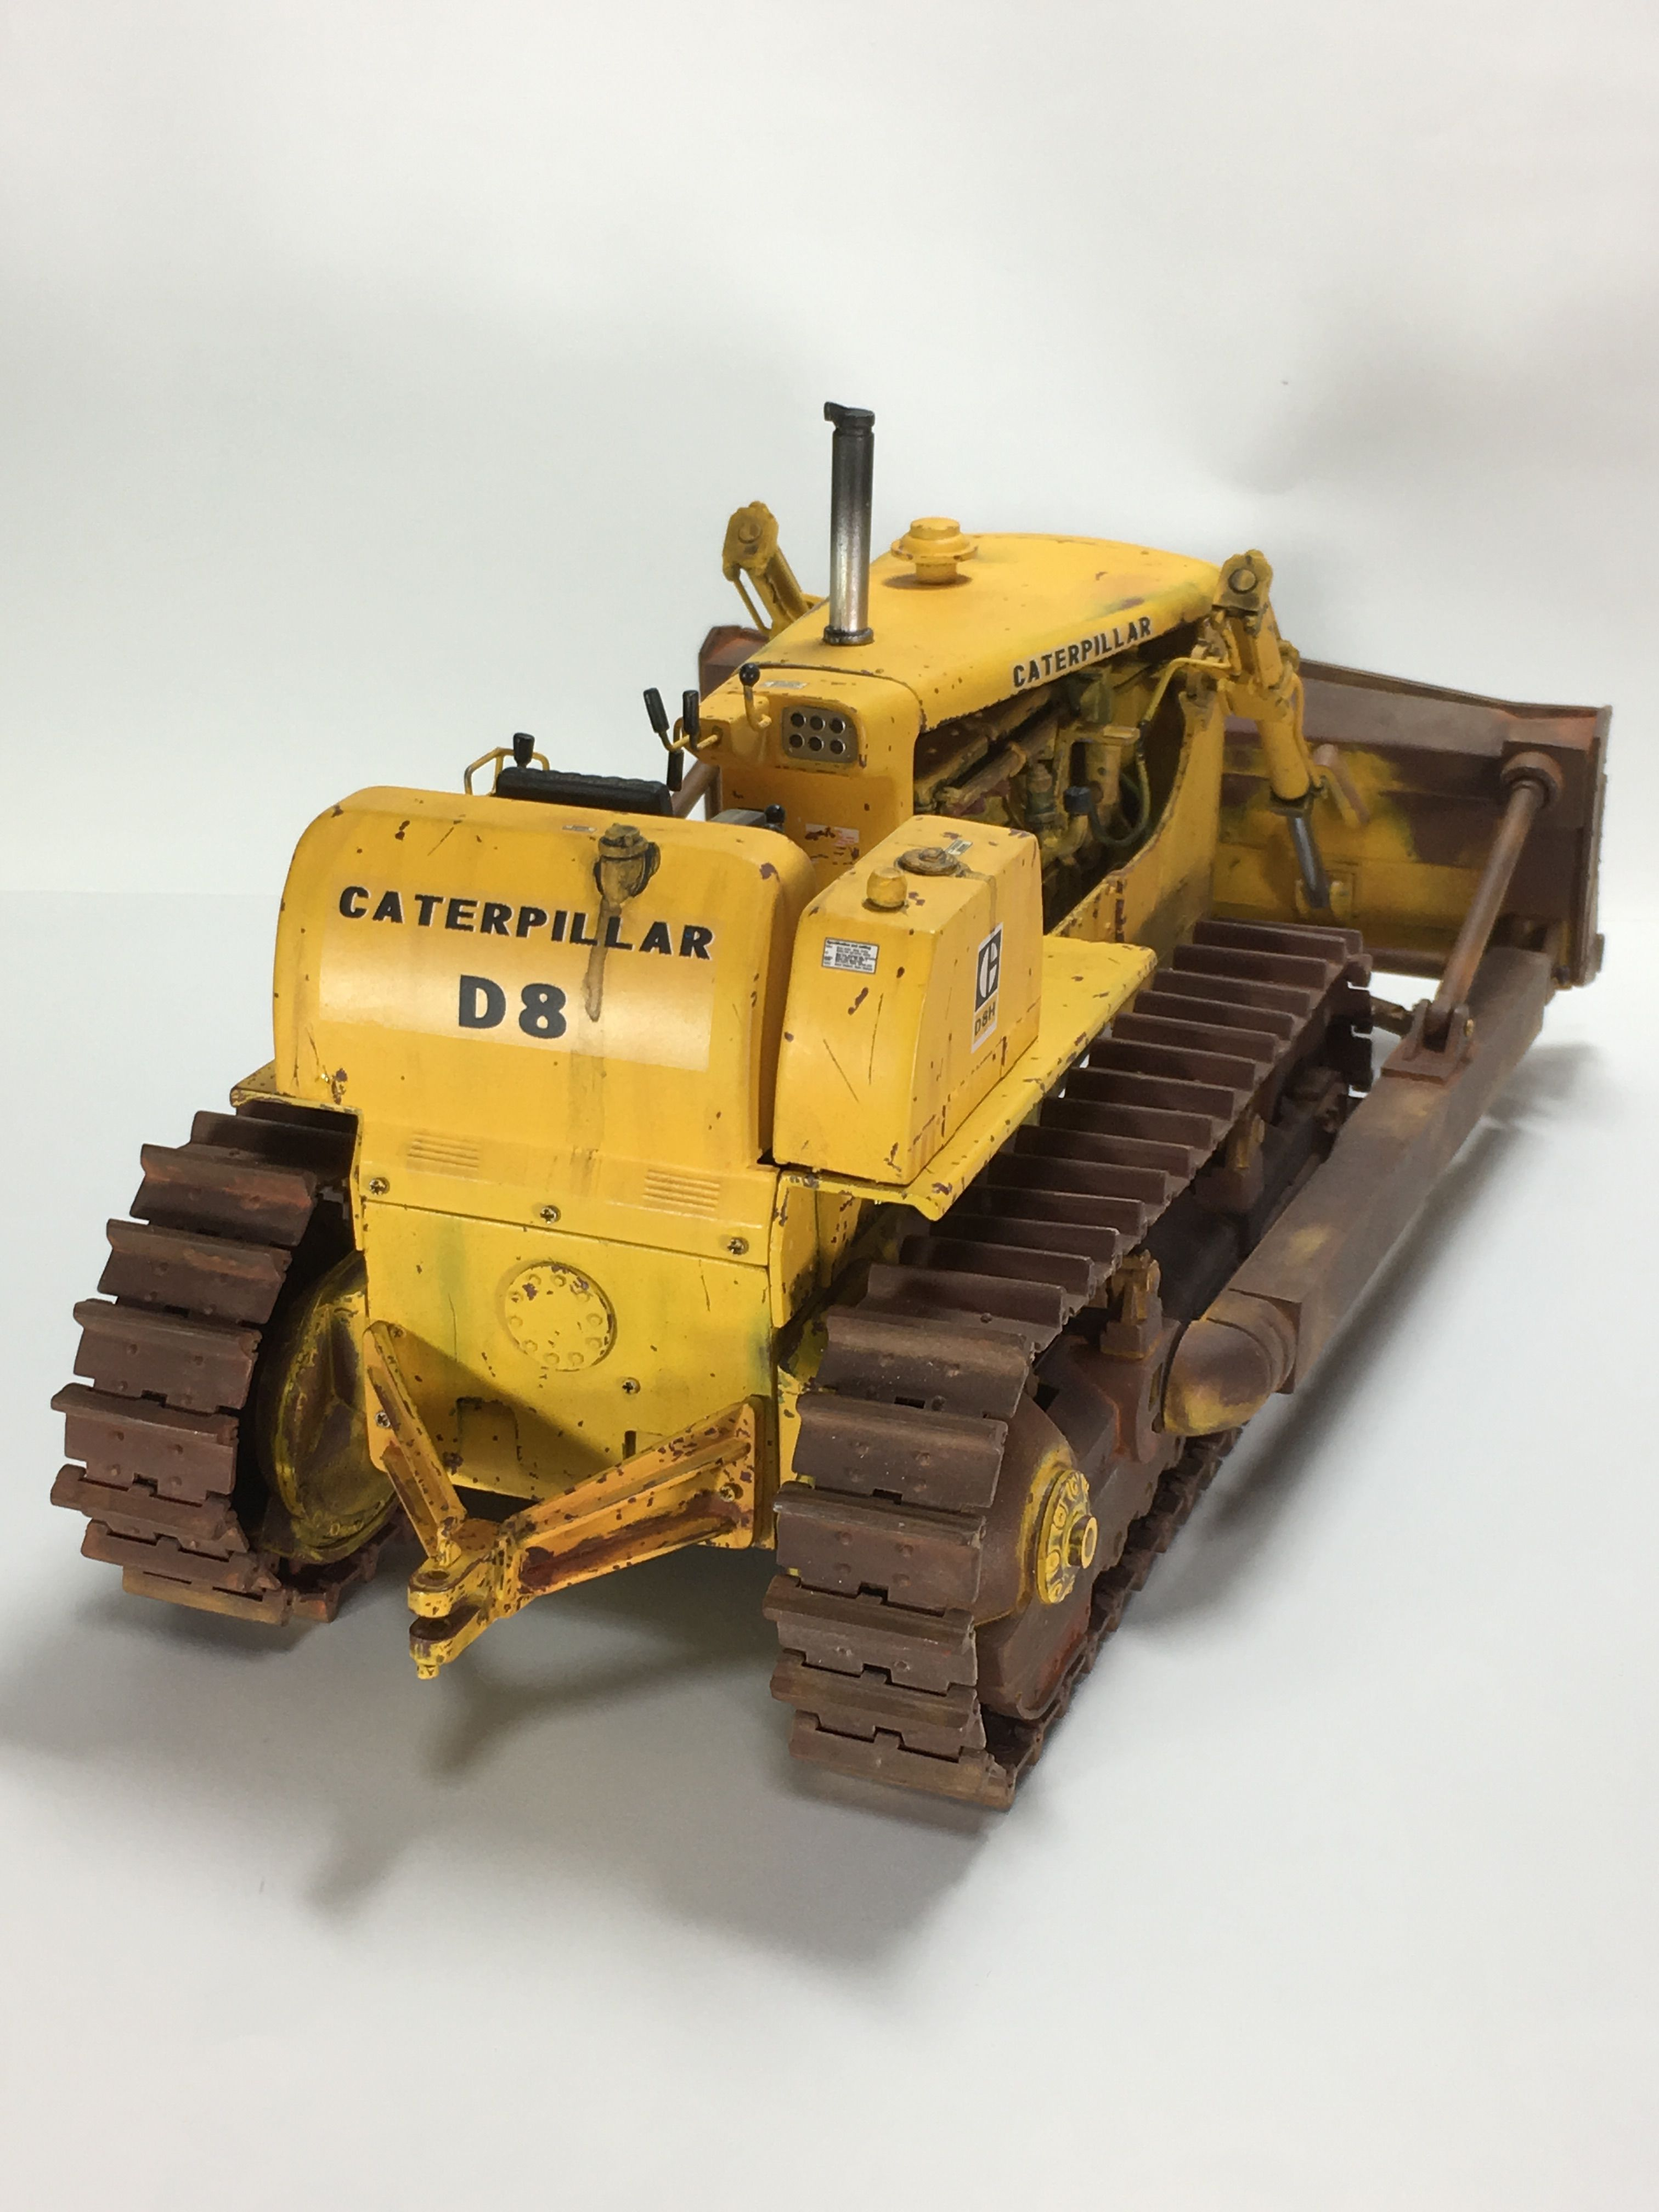 Pin by Mico Equipment on Classic Dozers | Caterpillar